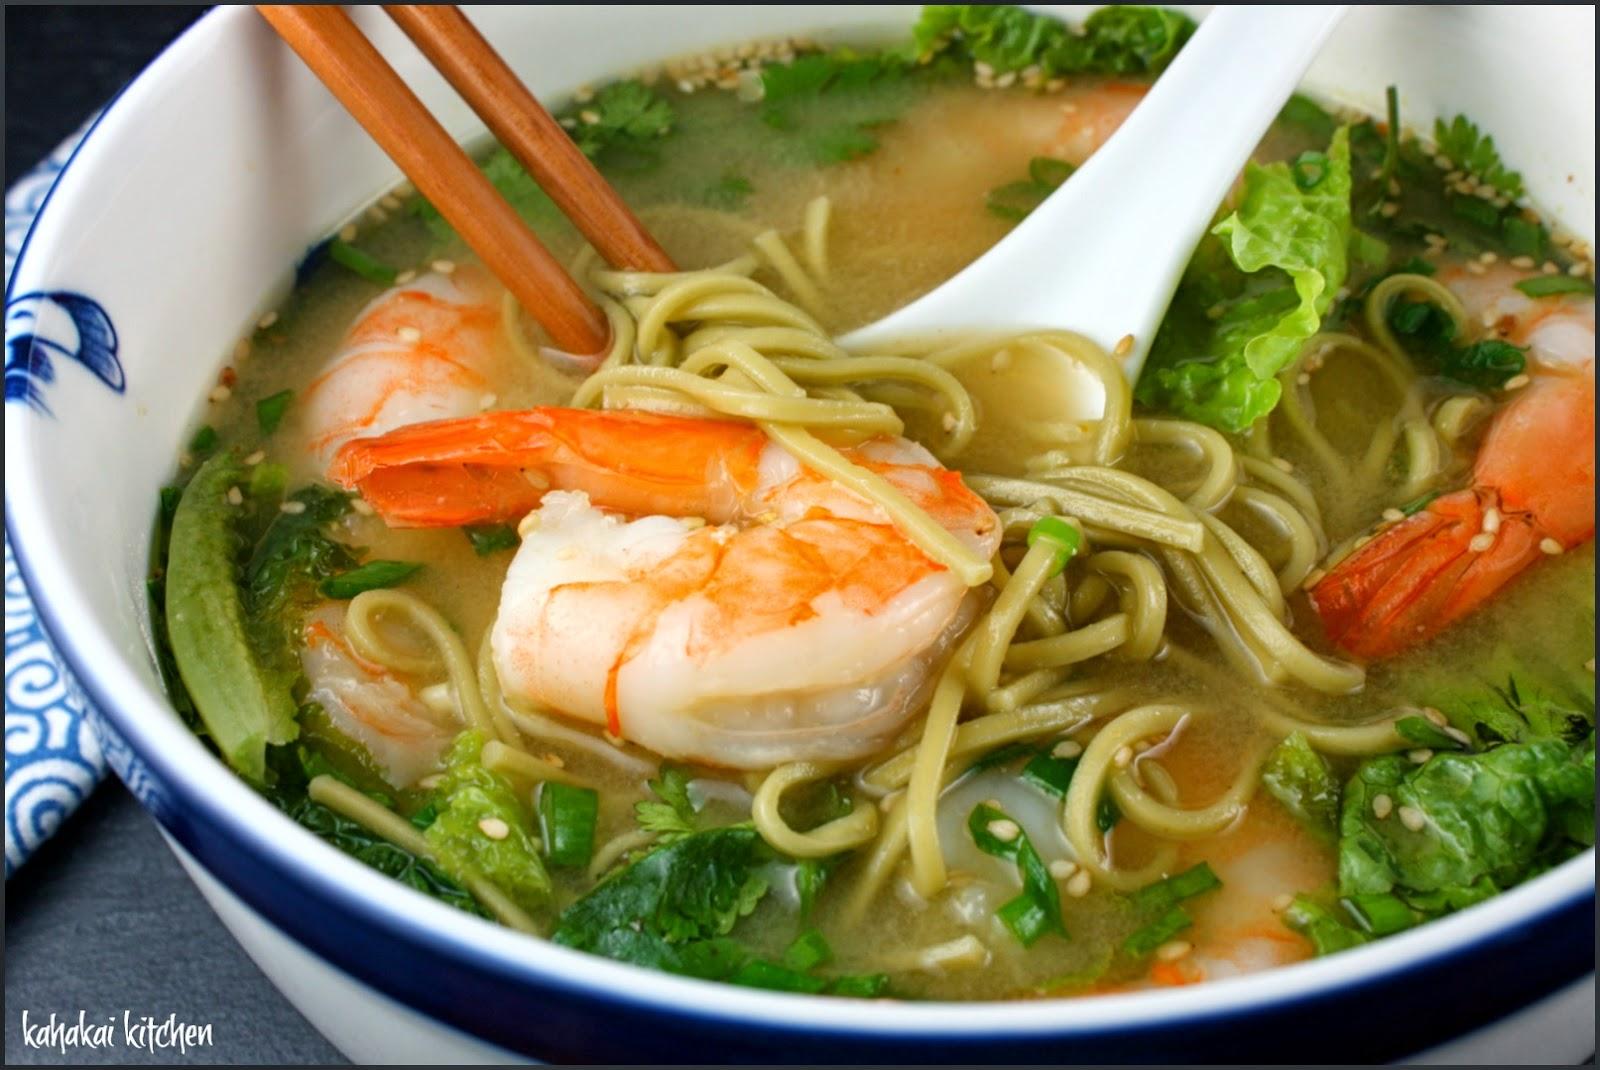 Miso Soup With Prawns And Green Tea Noodles For Souper Soup Salad Sammie Sundays